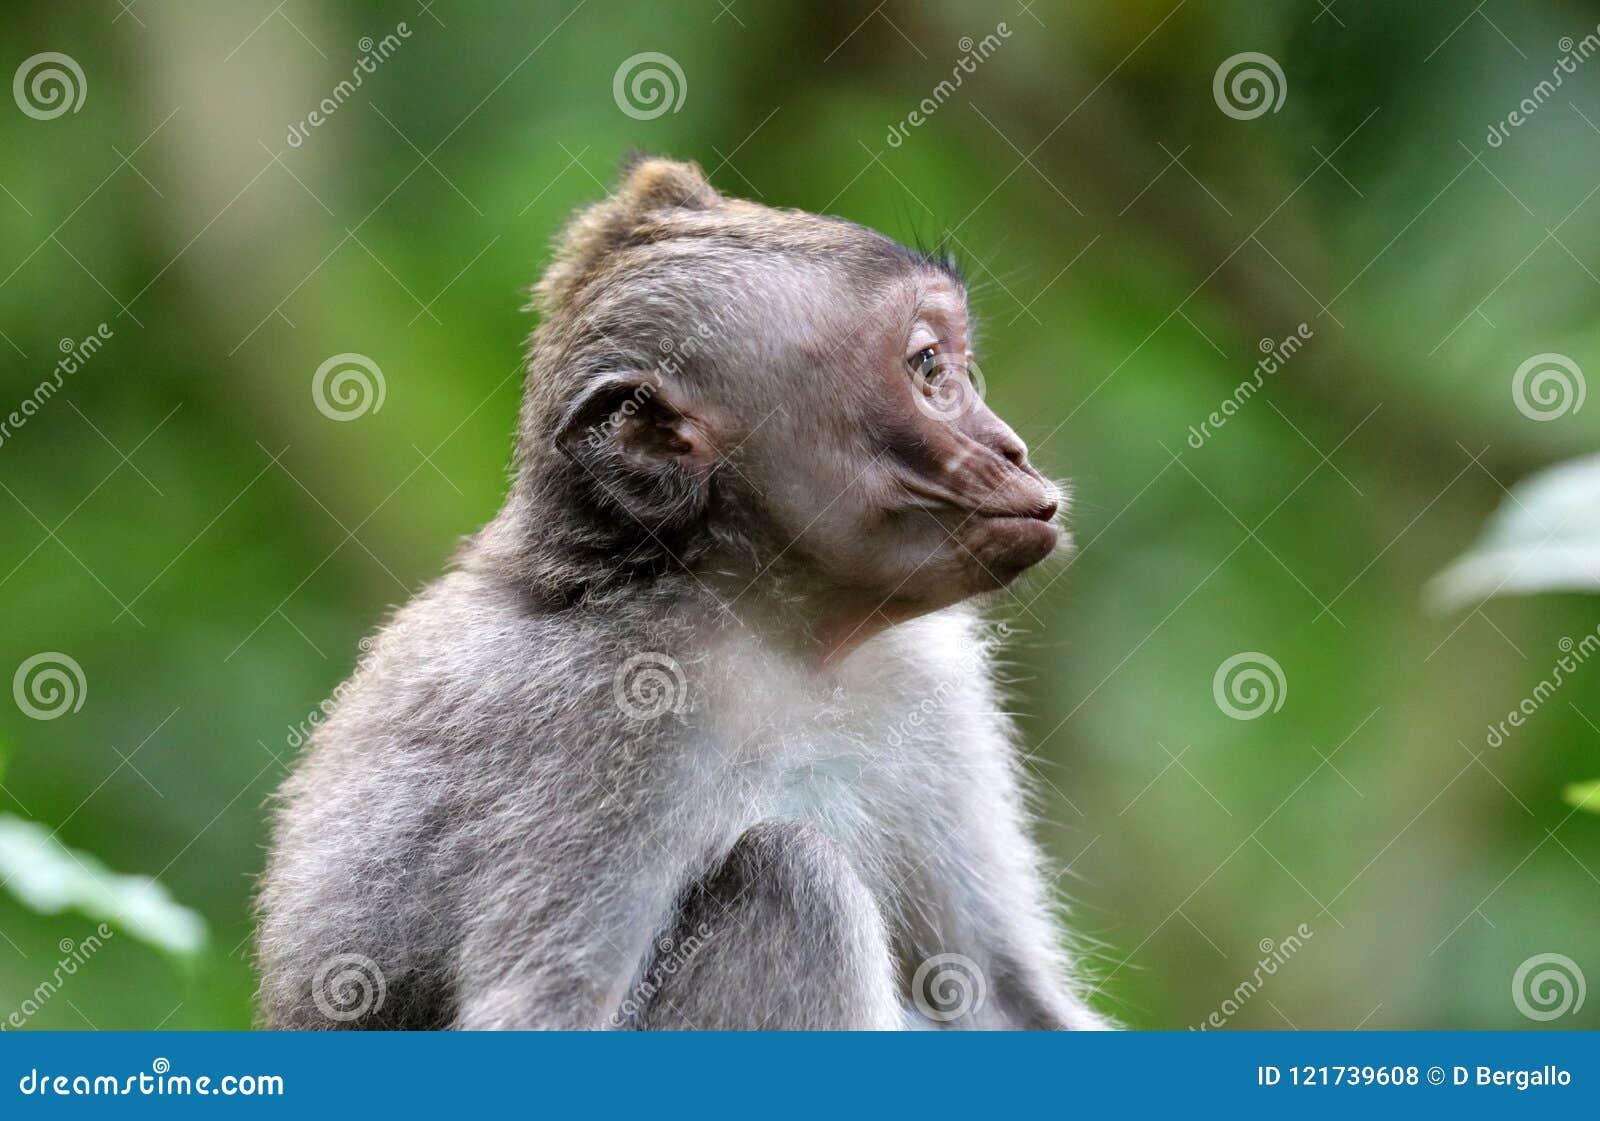 Beautiful unique portrait kiss monkey at monkeys forest in Bali Indonesia, pretty wild animal.